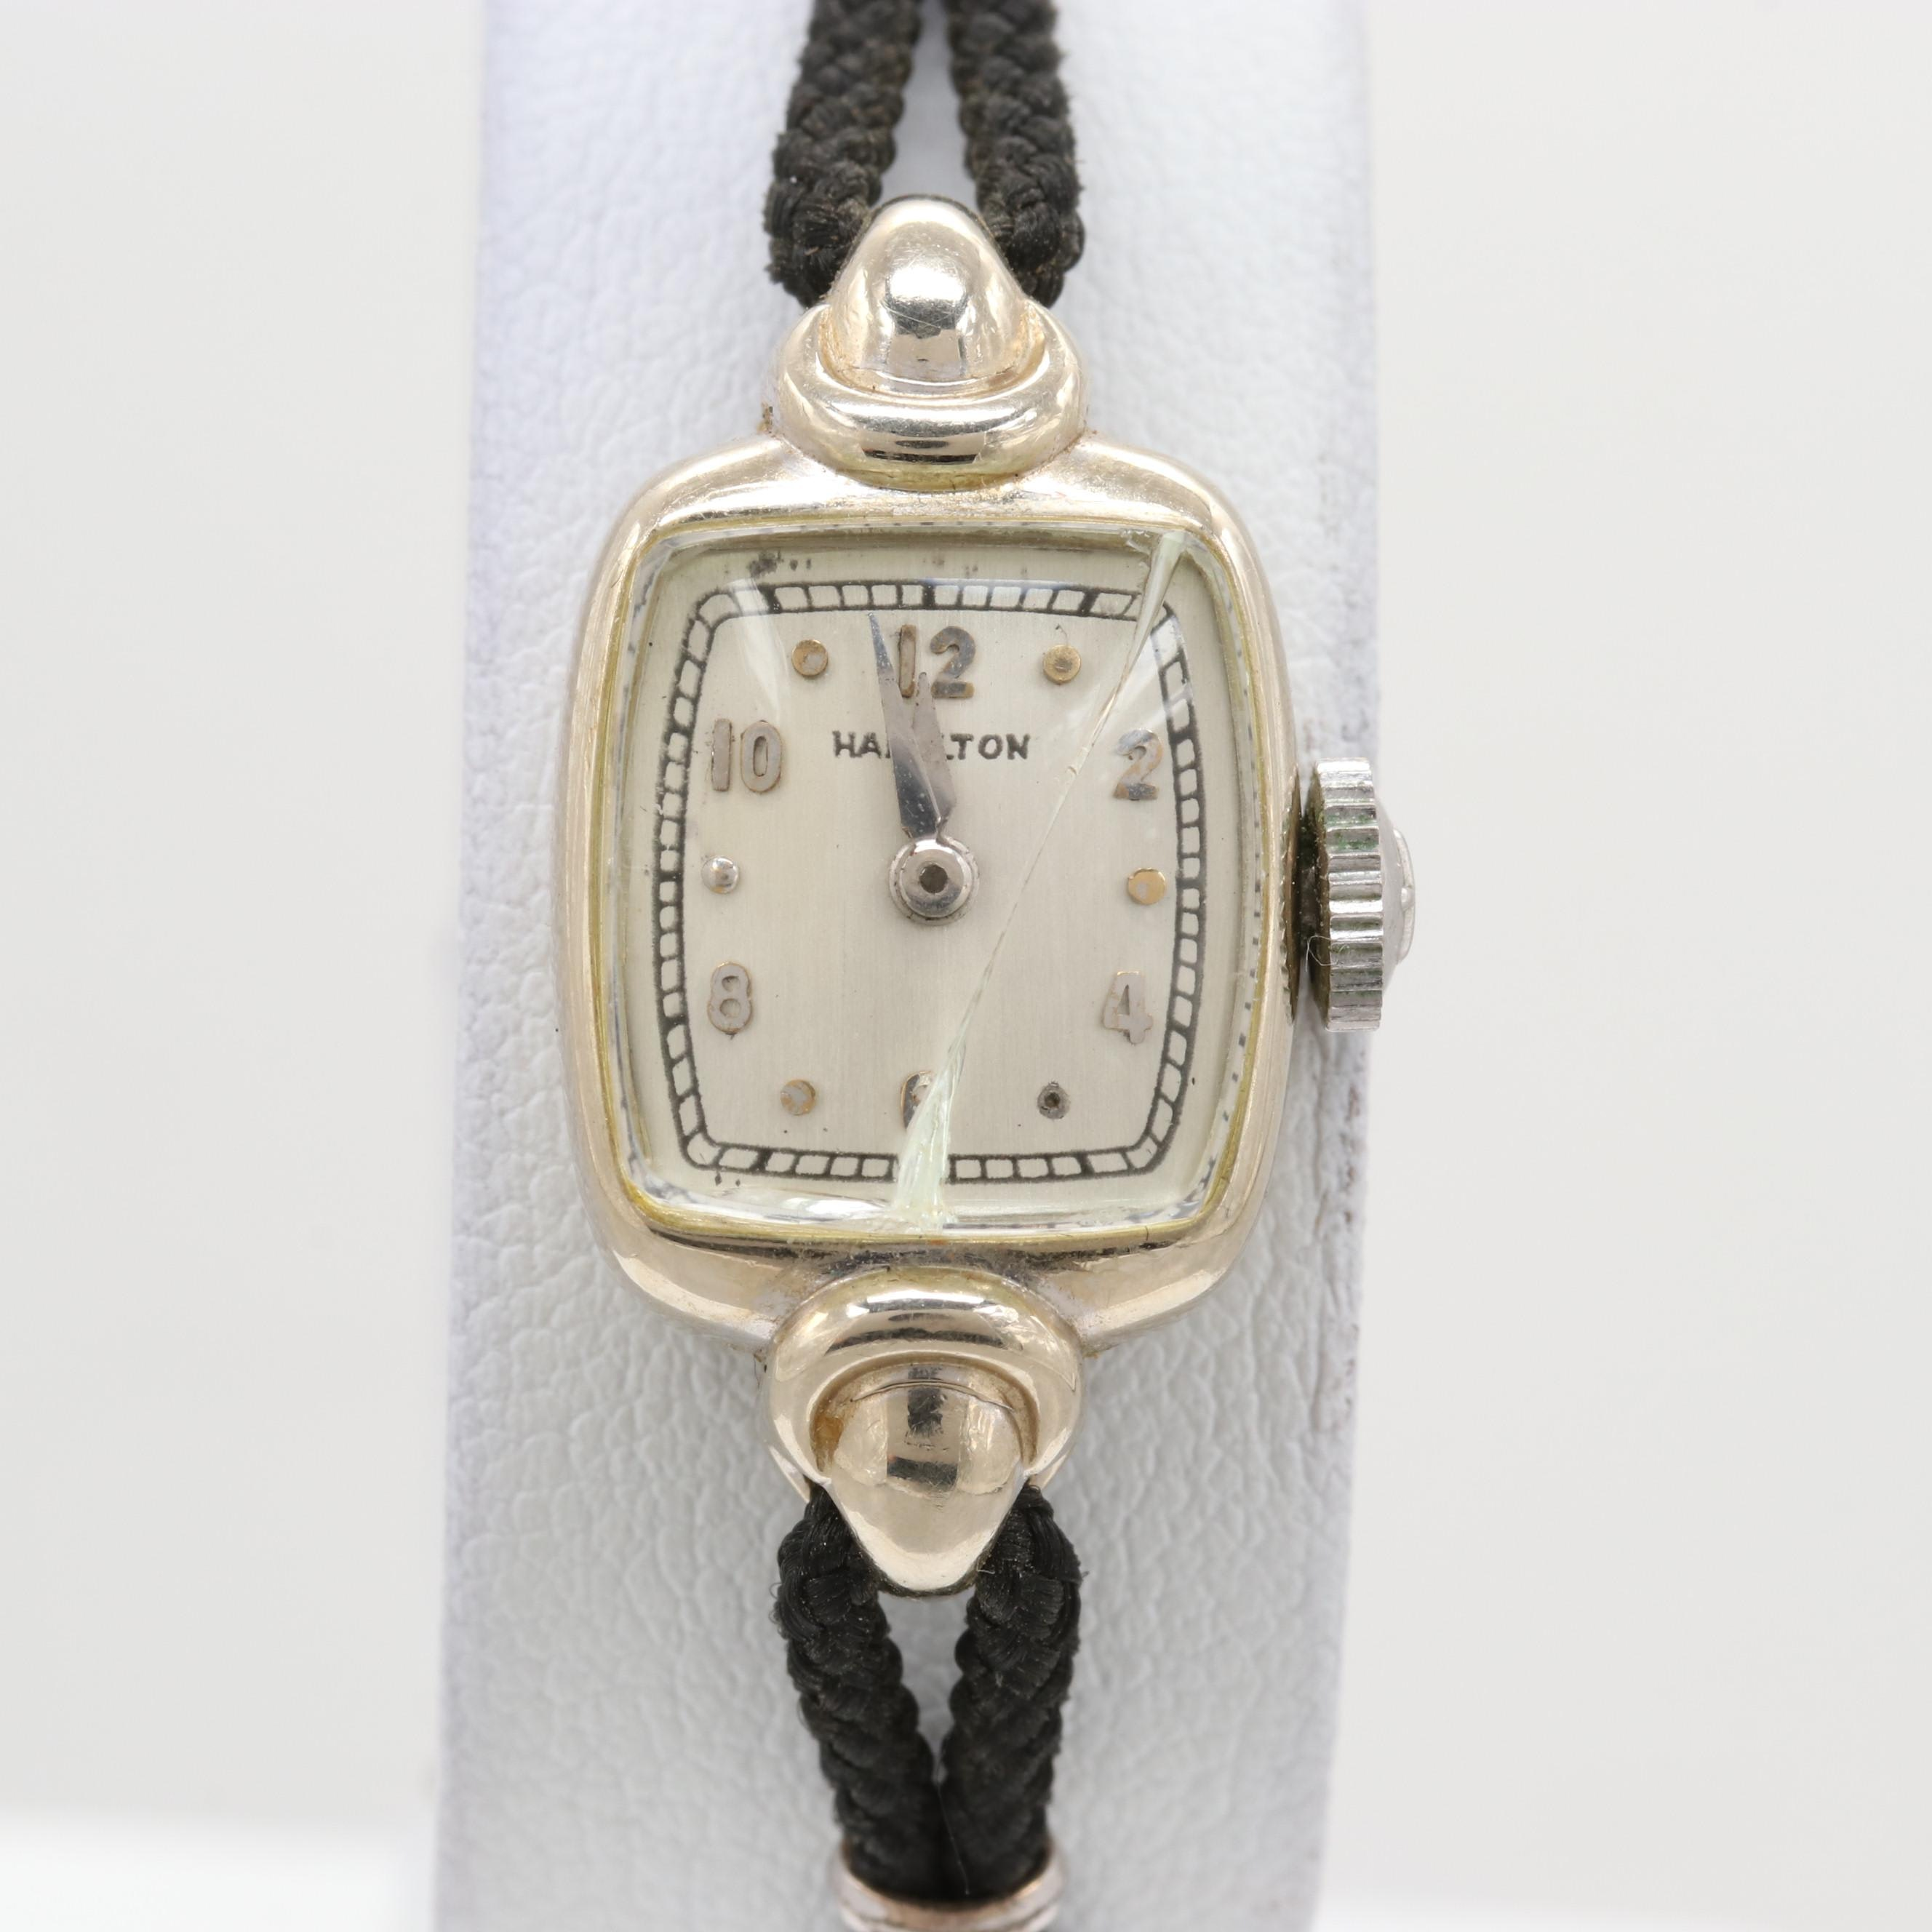 Vintage Hamilton Jessica 14K White Gold Stem Wind Wristwatch